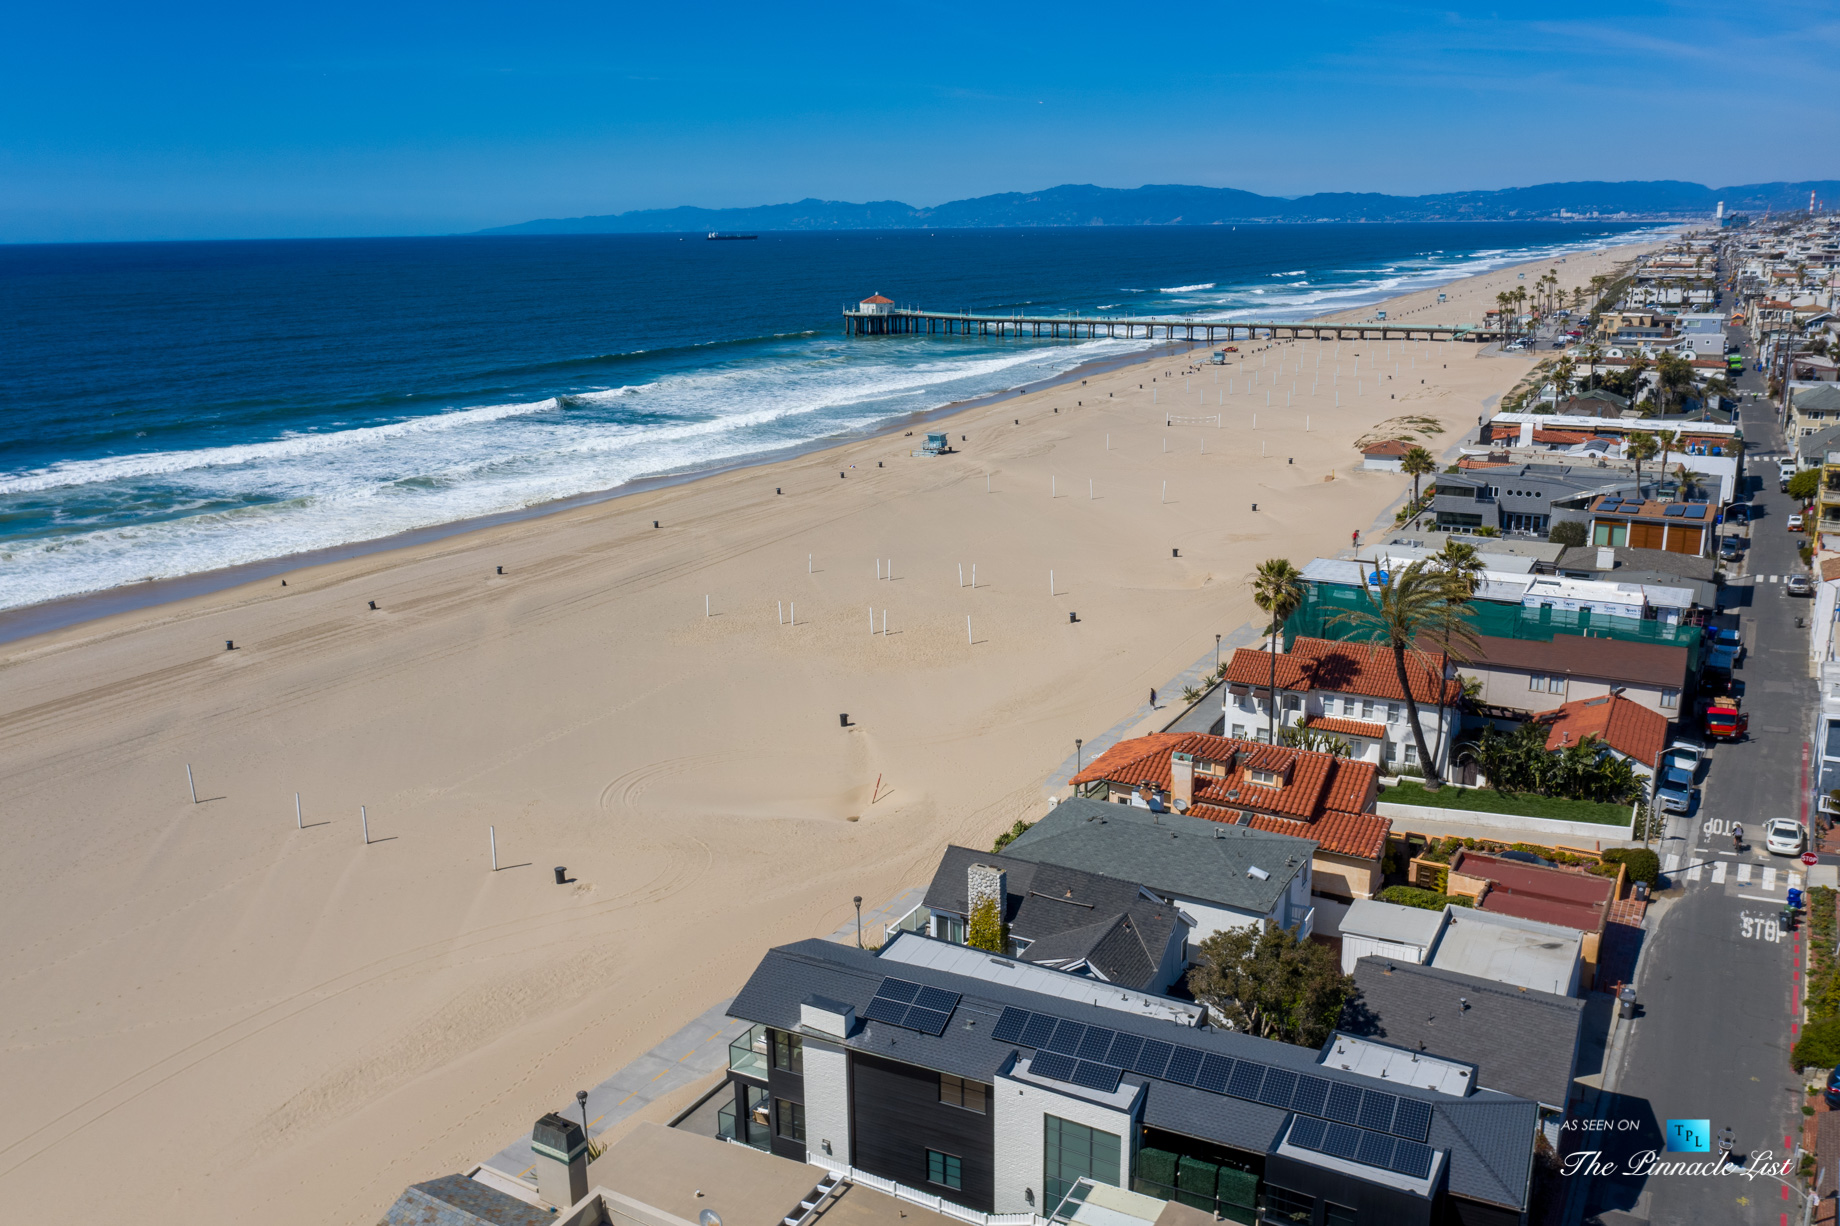 508 The Strand, Manhattan Beach, CA, USA – The Strand Beach Drone View – Luxury Real Estate – Oceanfront Home